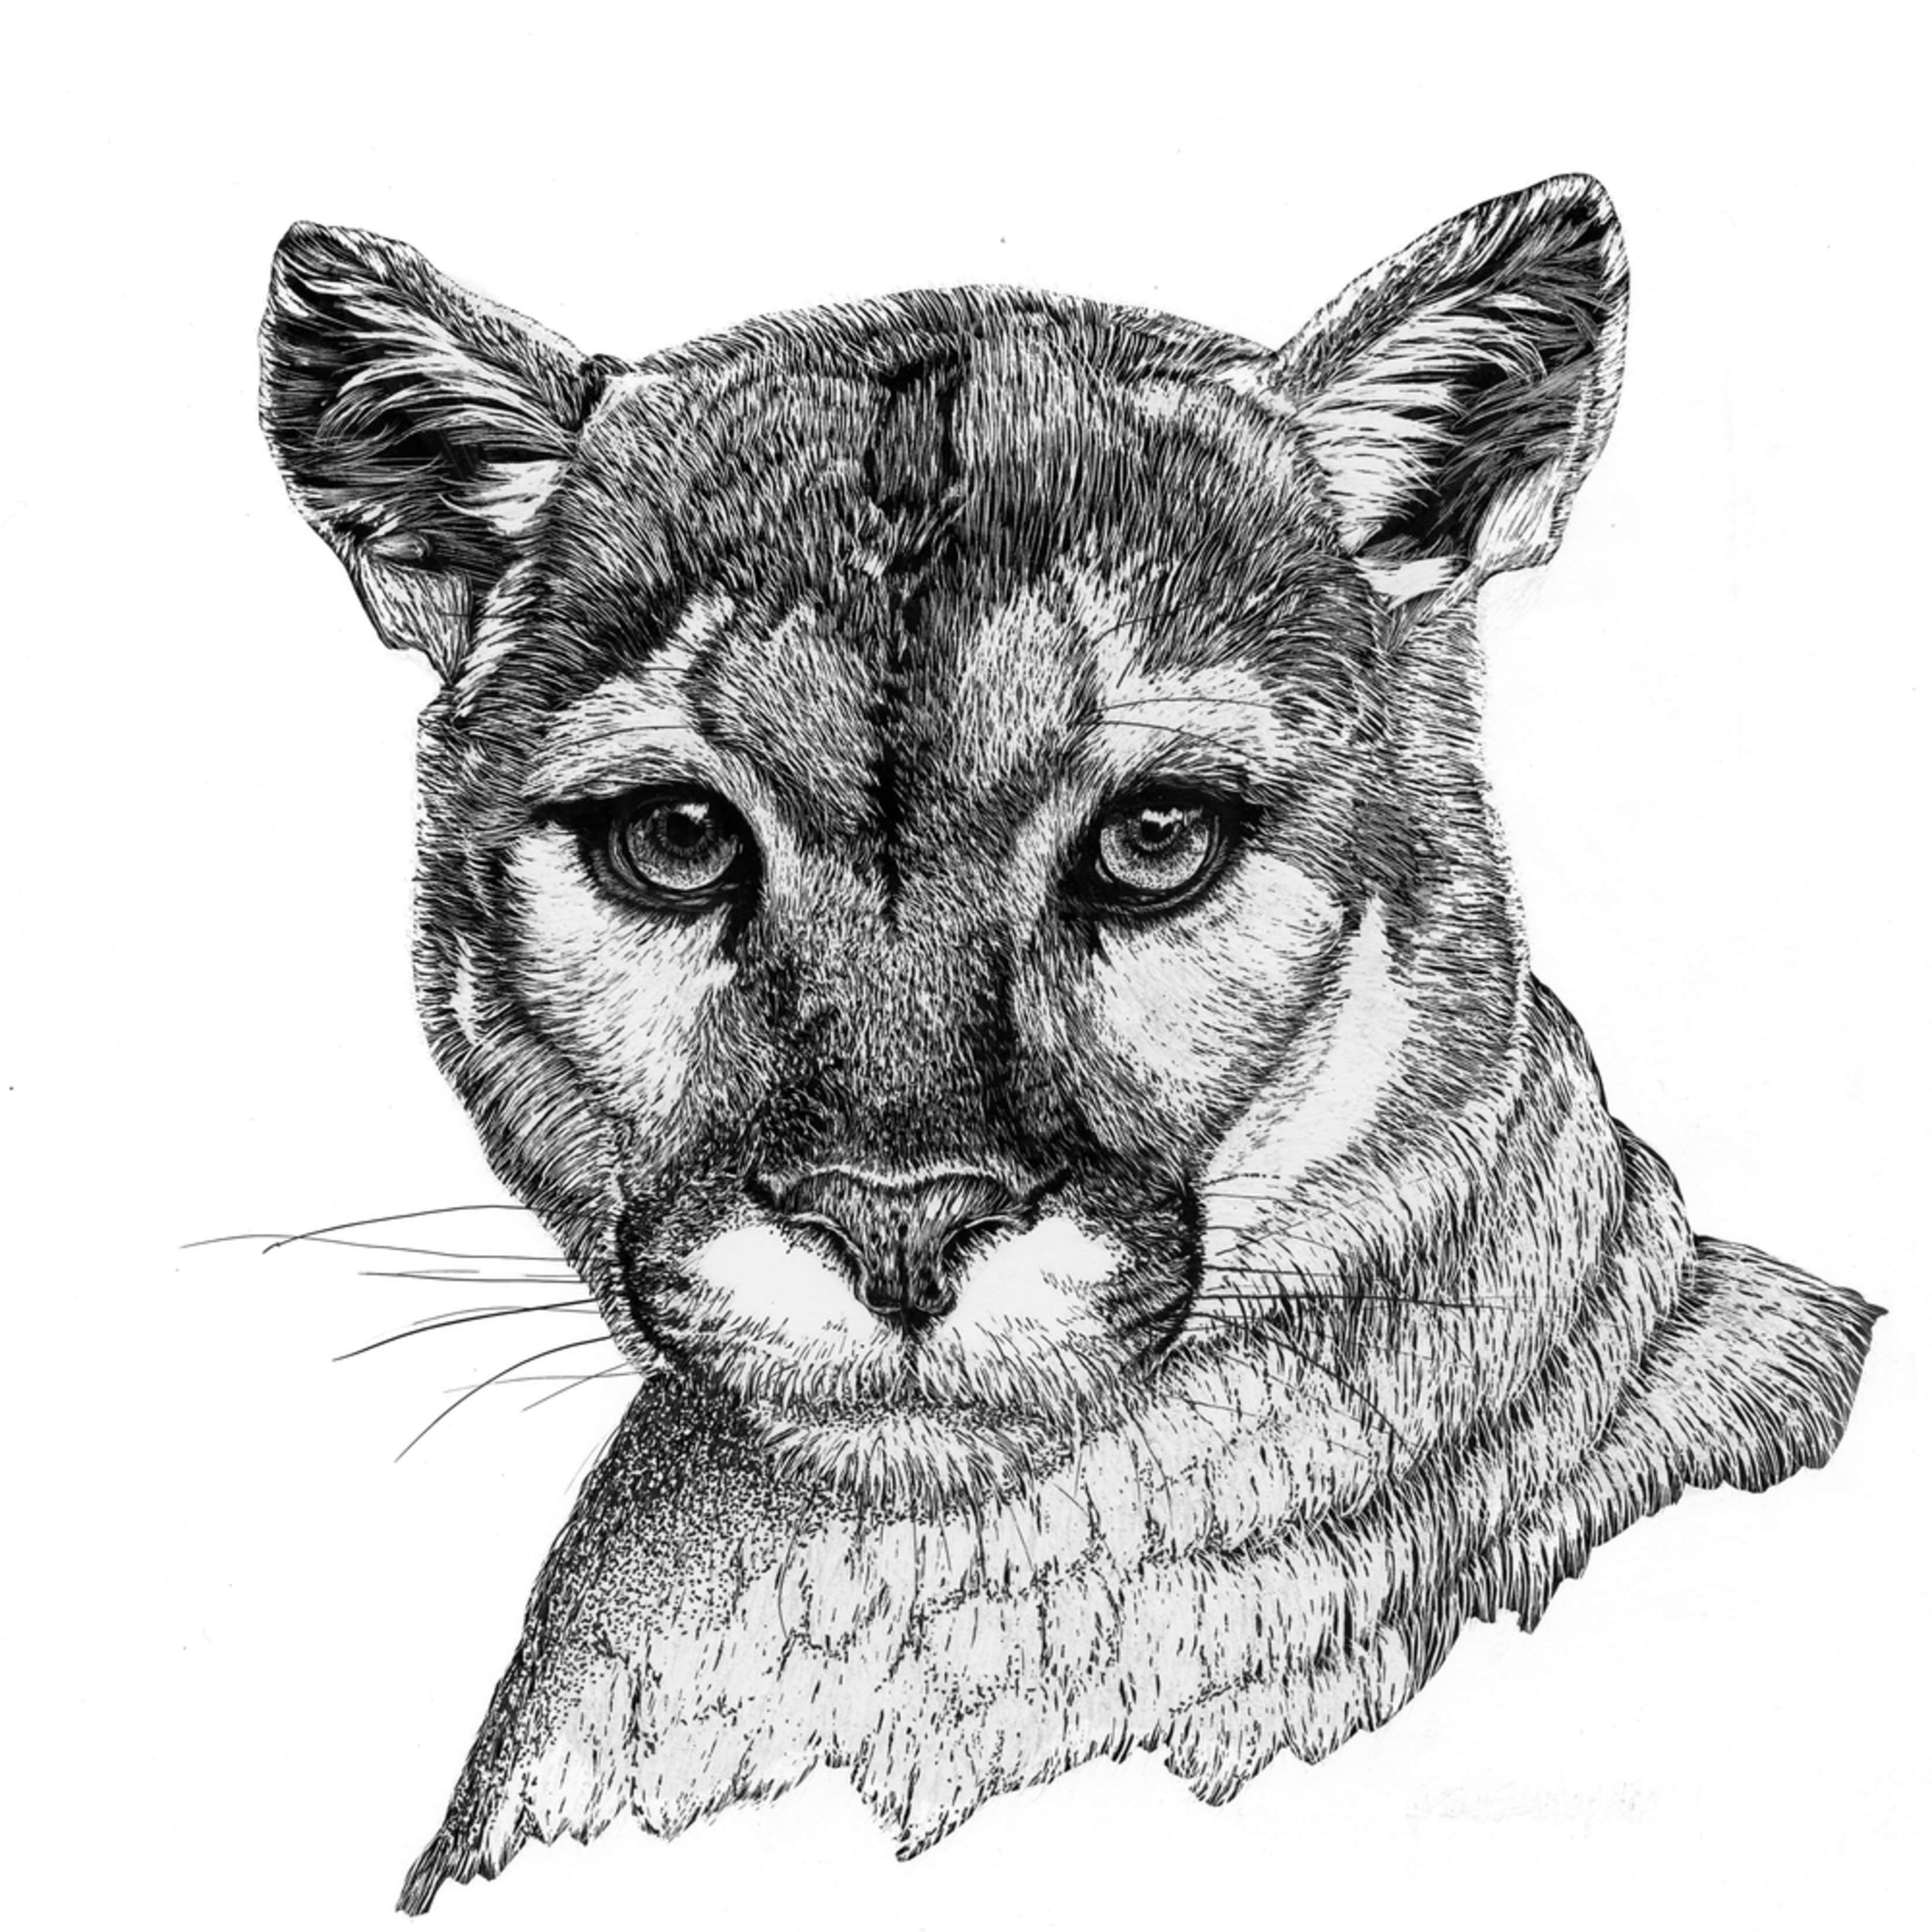 Mt lion new ws0t2f